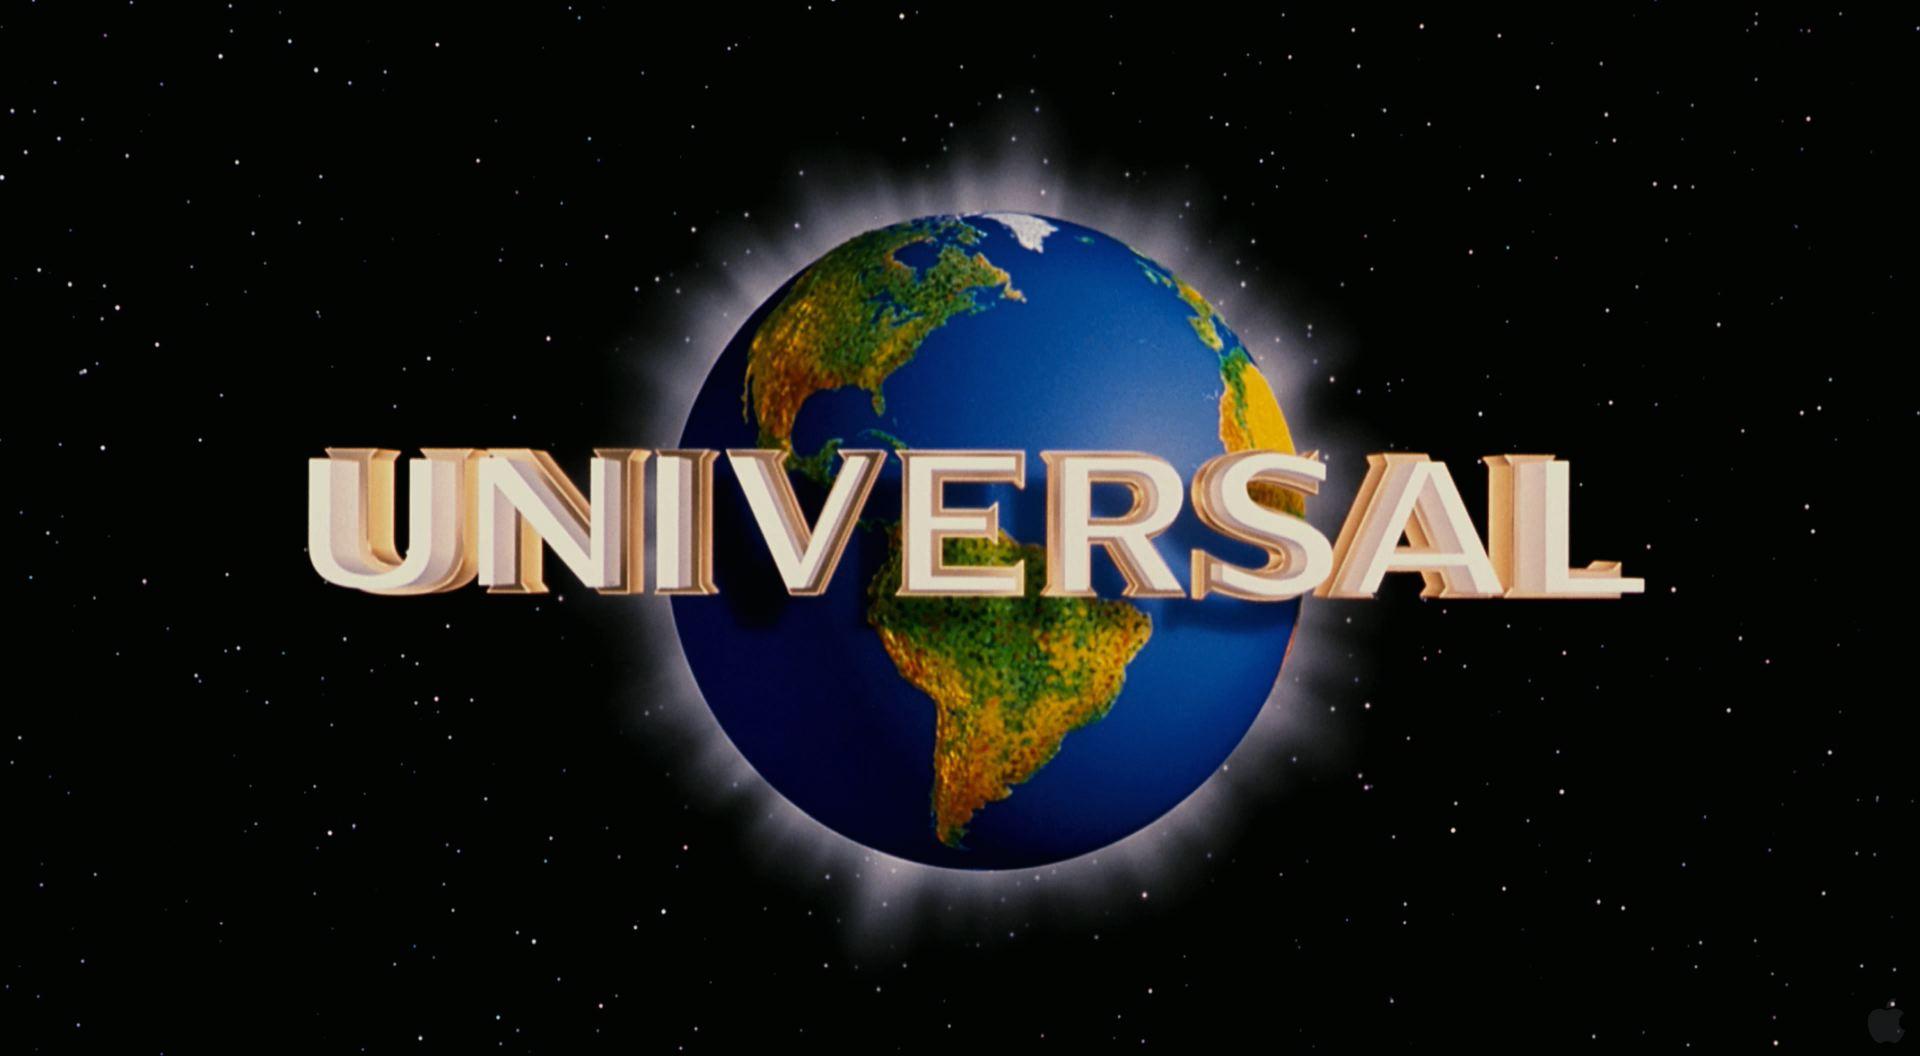 universal-studios-logo-wallpaper.jpg